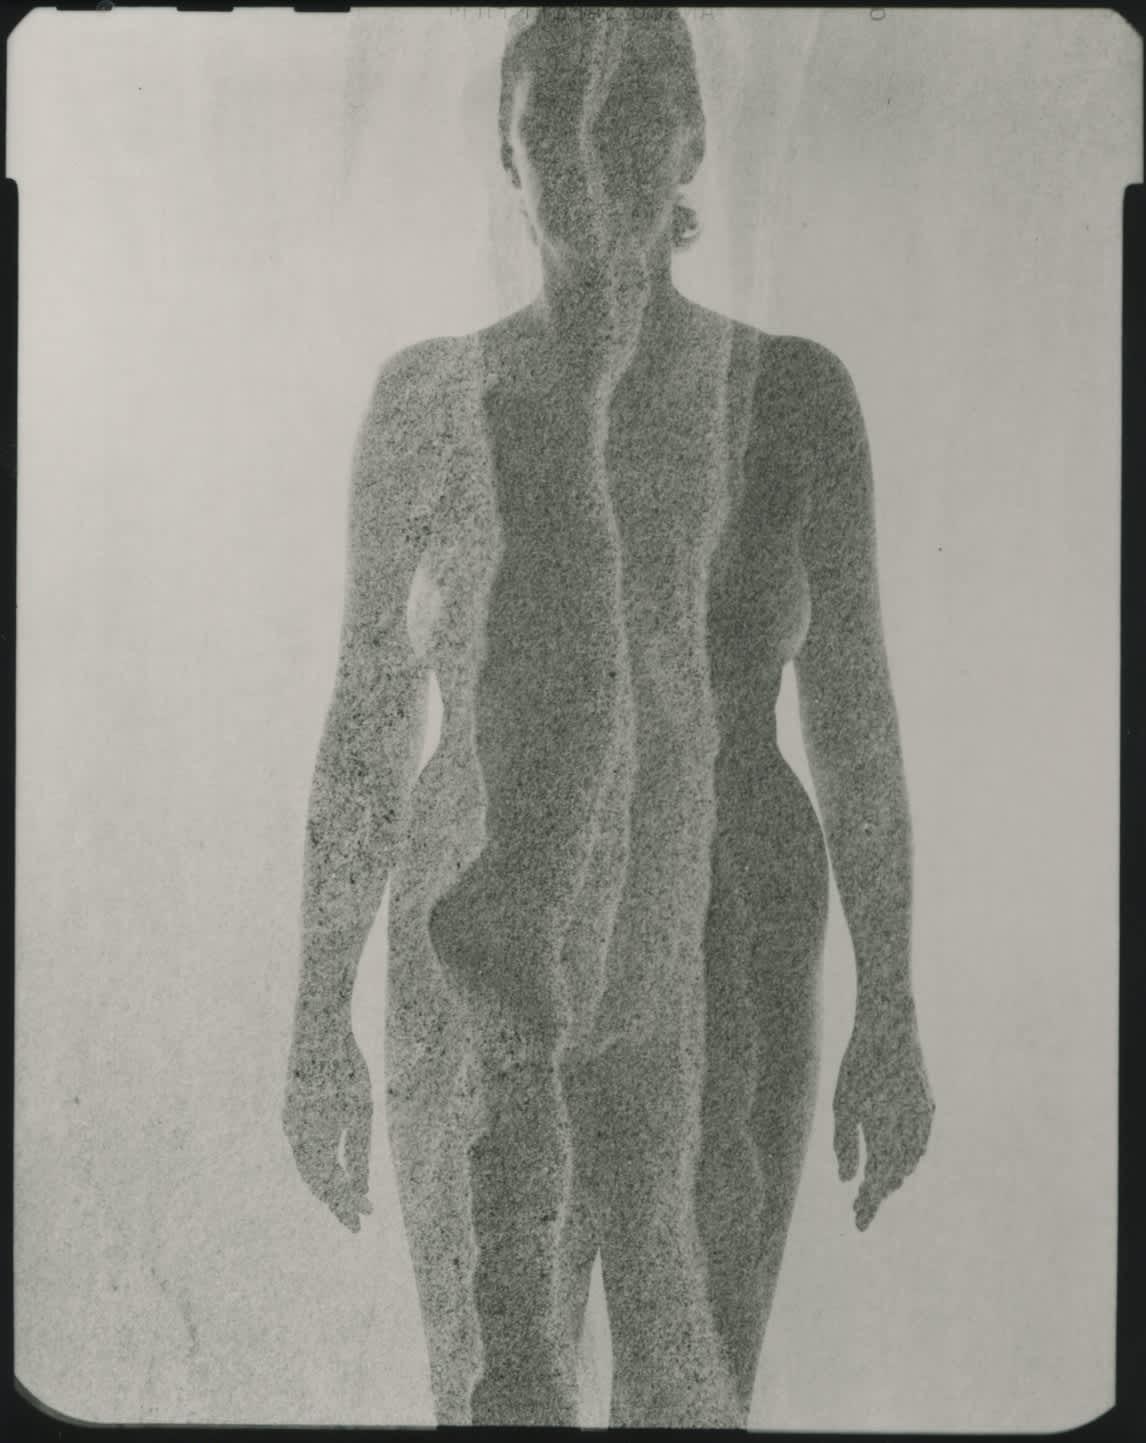 Harry Callahan, Eleanor, Chicago, 1952